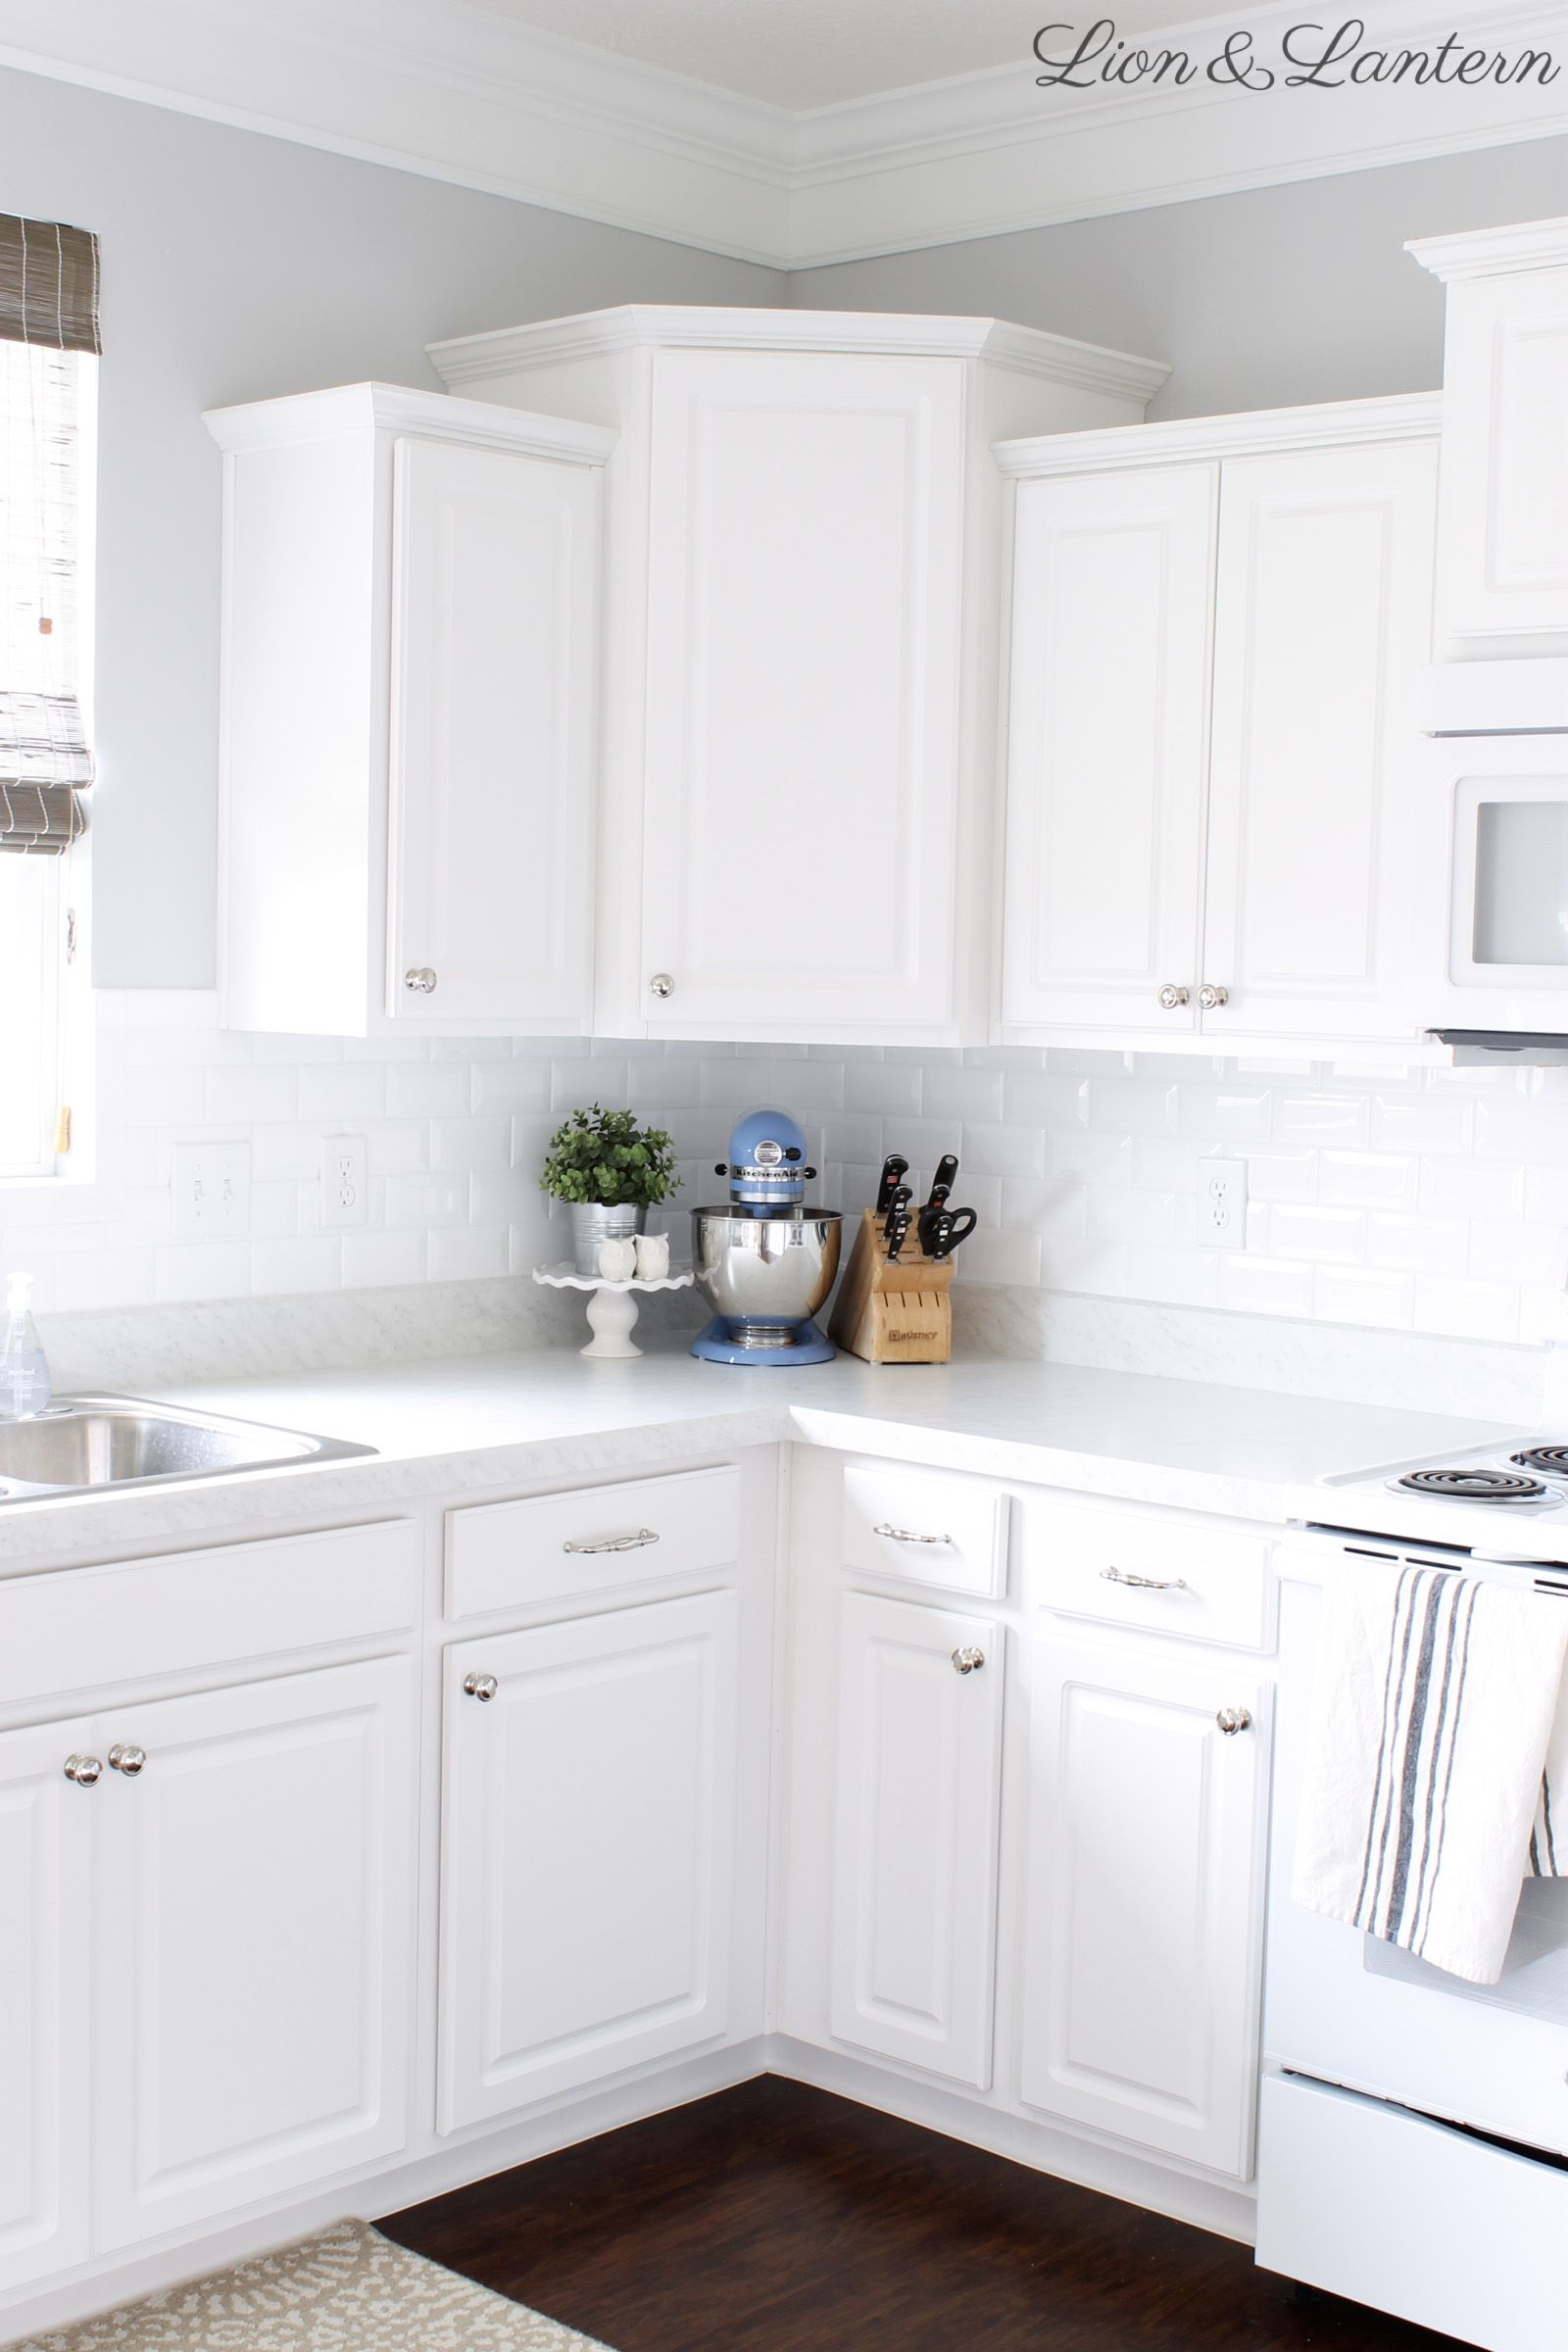 Builder Grade Kitchen Update At Lionandlantern Com White Subway Tile Beveled Subway Builder Grade Kitchen Diy Kitchen Countertops Traditional Kitchen Design